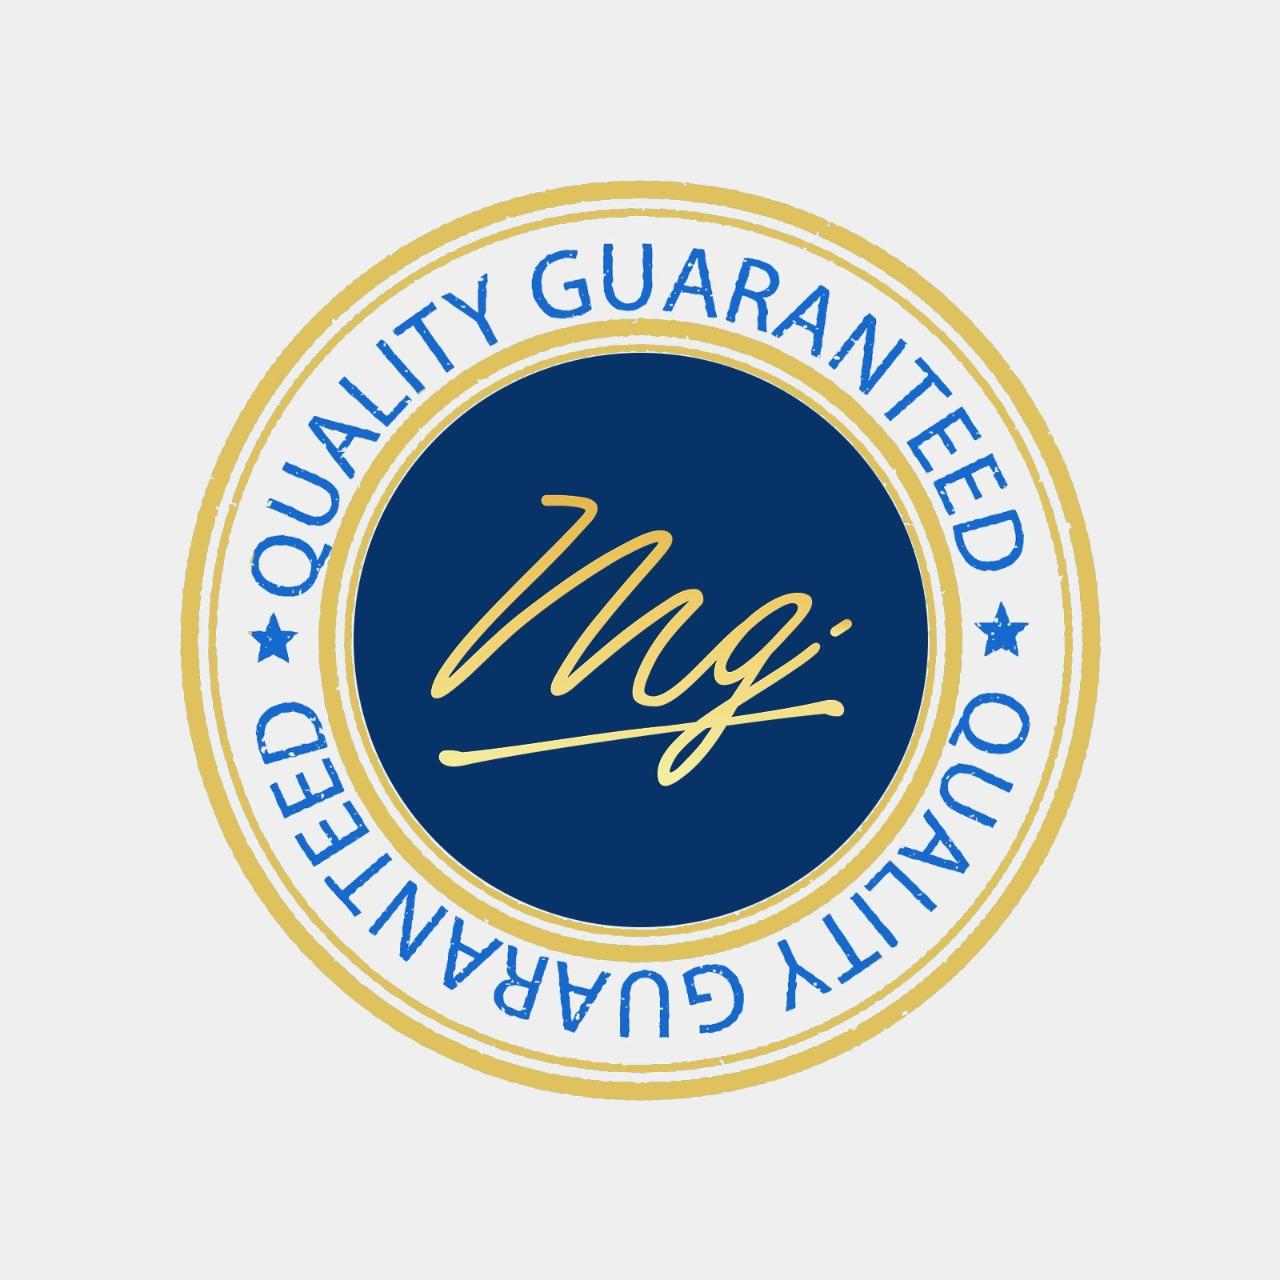 Quality Garanted MG